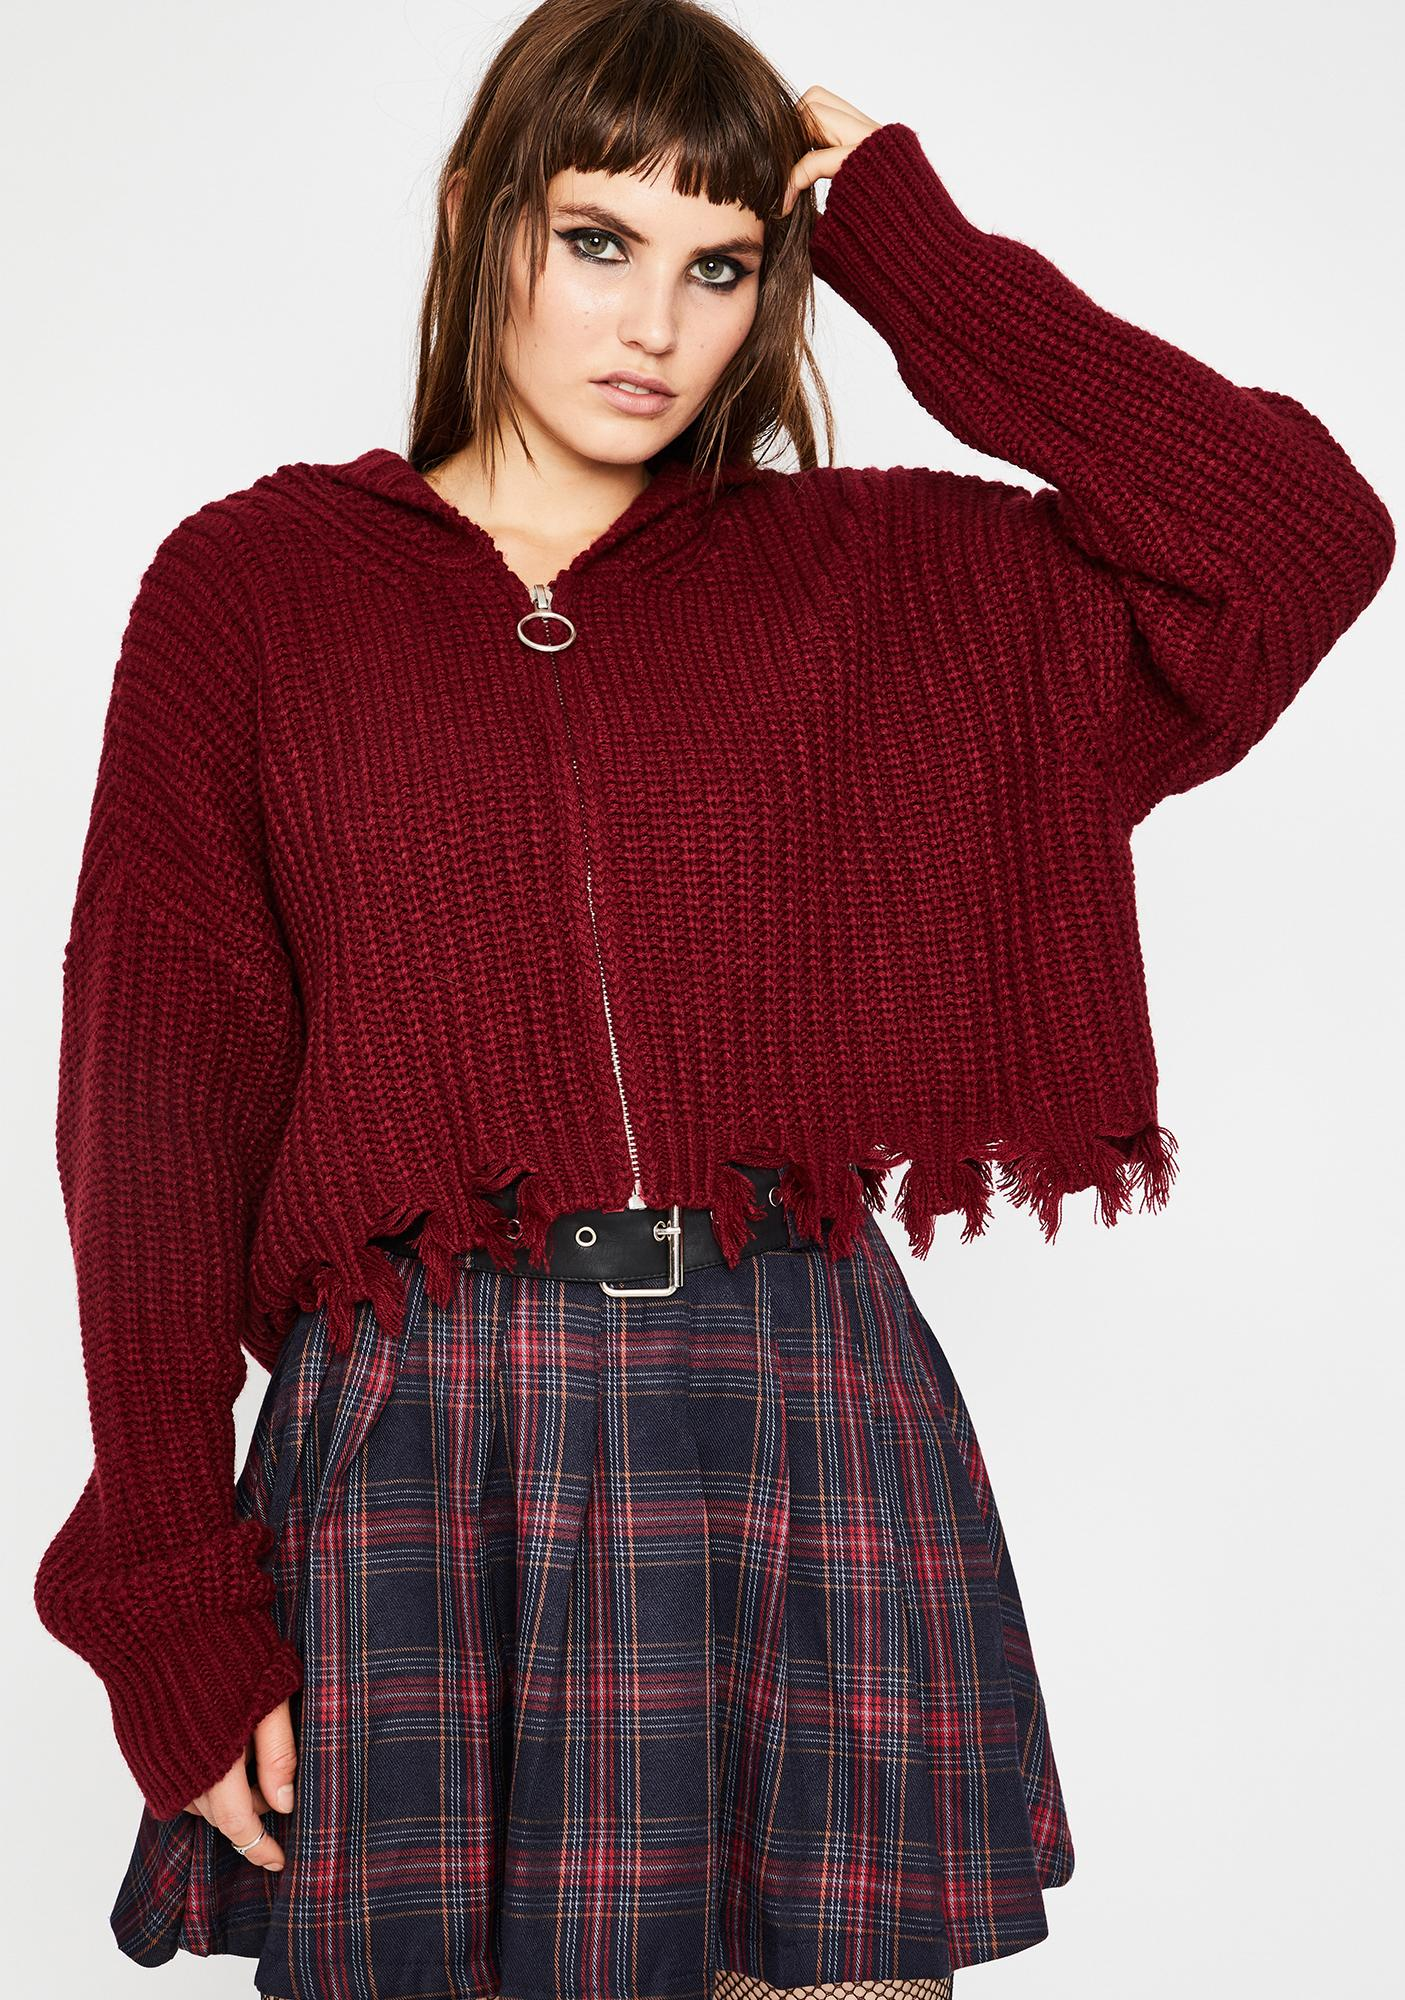 Current Mood Everything Sucks Crop Sweater